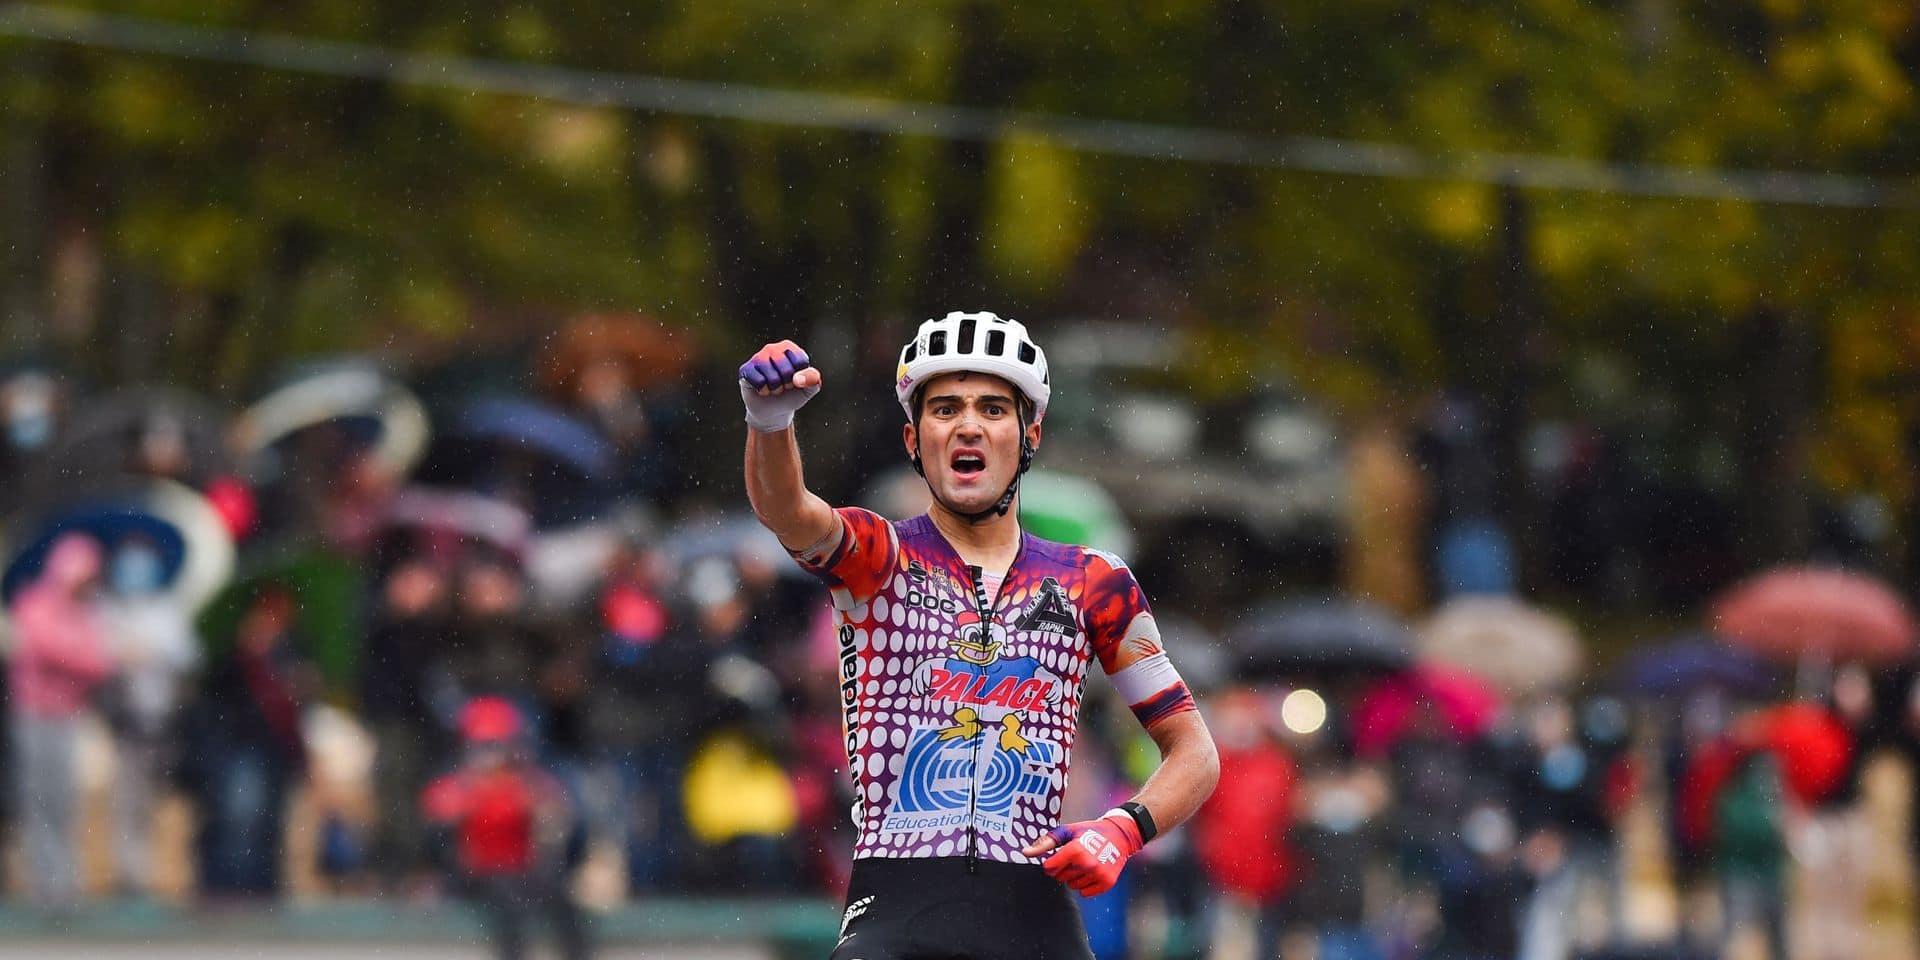 Tour d'Italie: Guerreiro gagne la 9e étape, Almeida toujours en rose